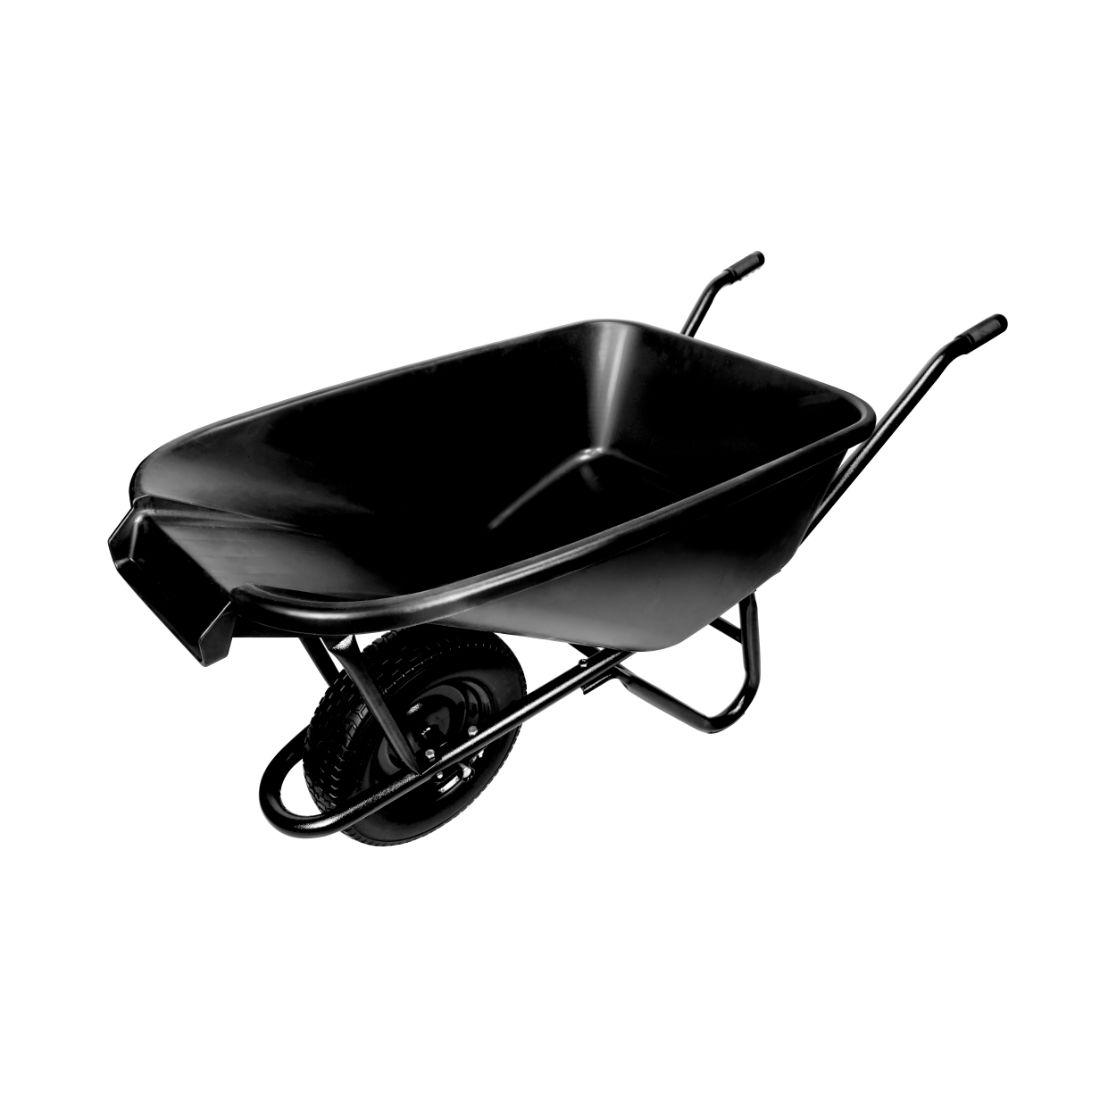 Maxpour Wheelbarrow 90L Black Edition